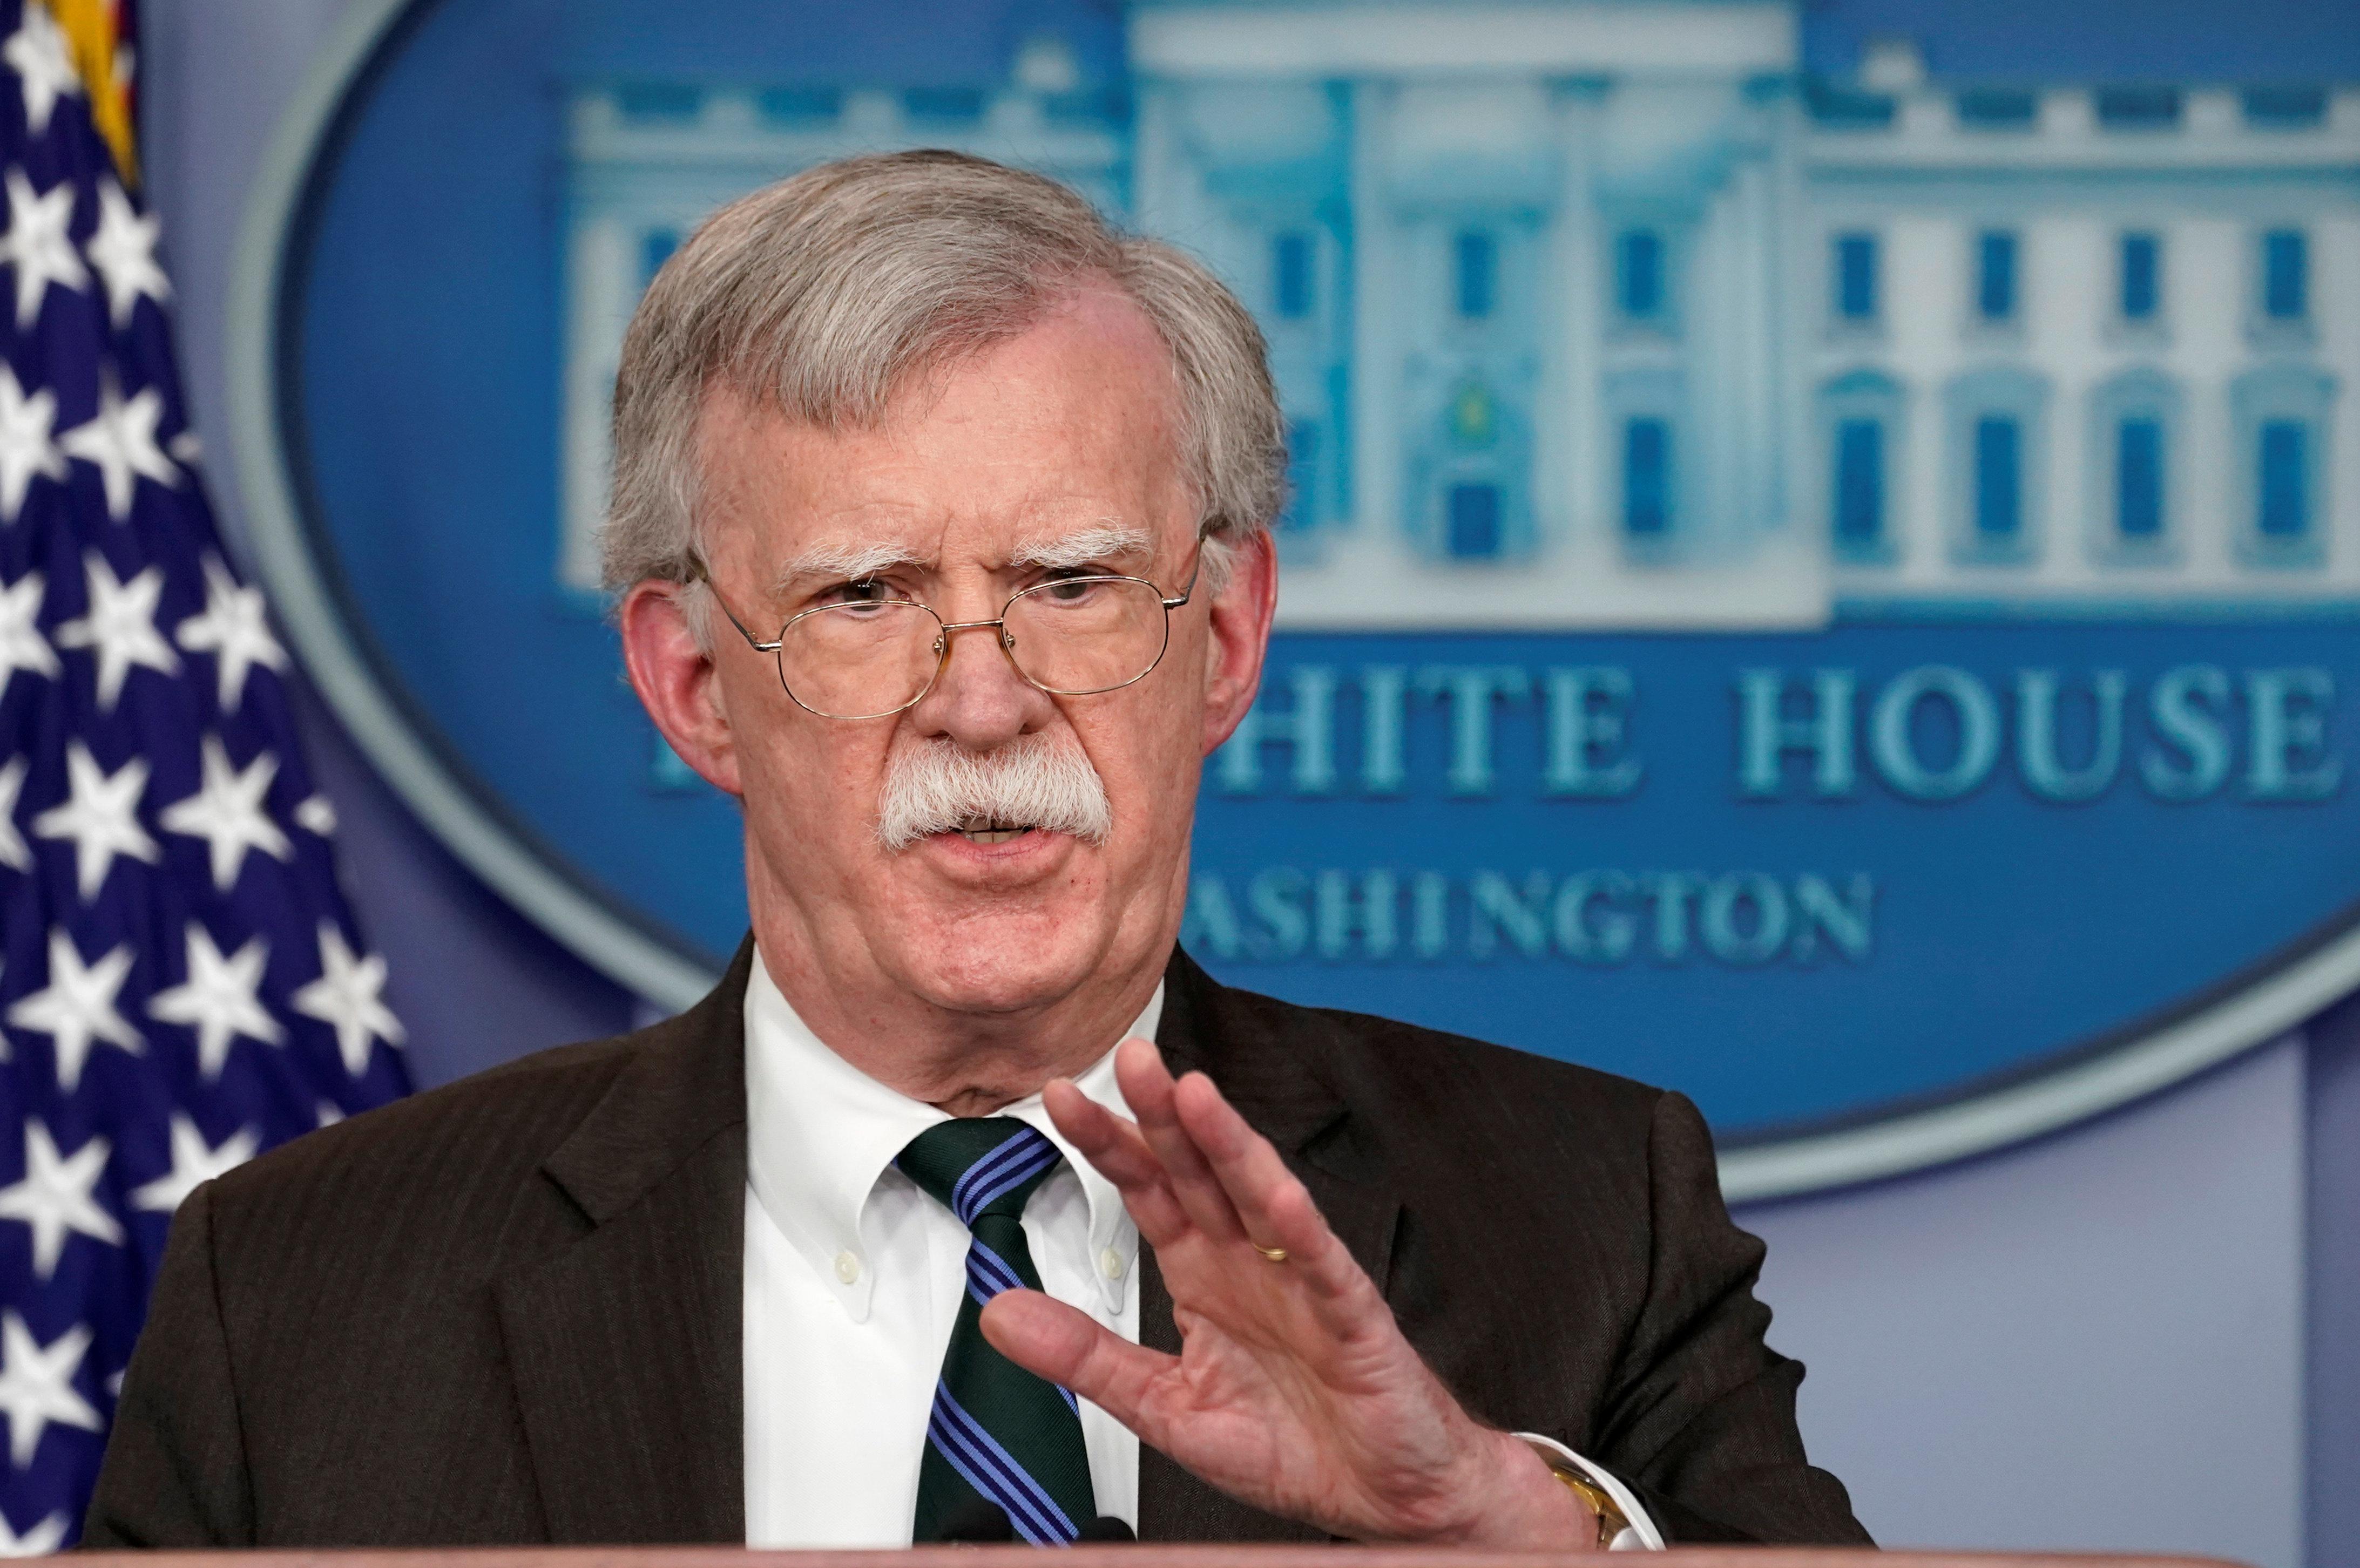 National Security Adviser John Bolton said he had no reason to listen to an audio recording ofJamal Khashoggi's